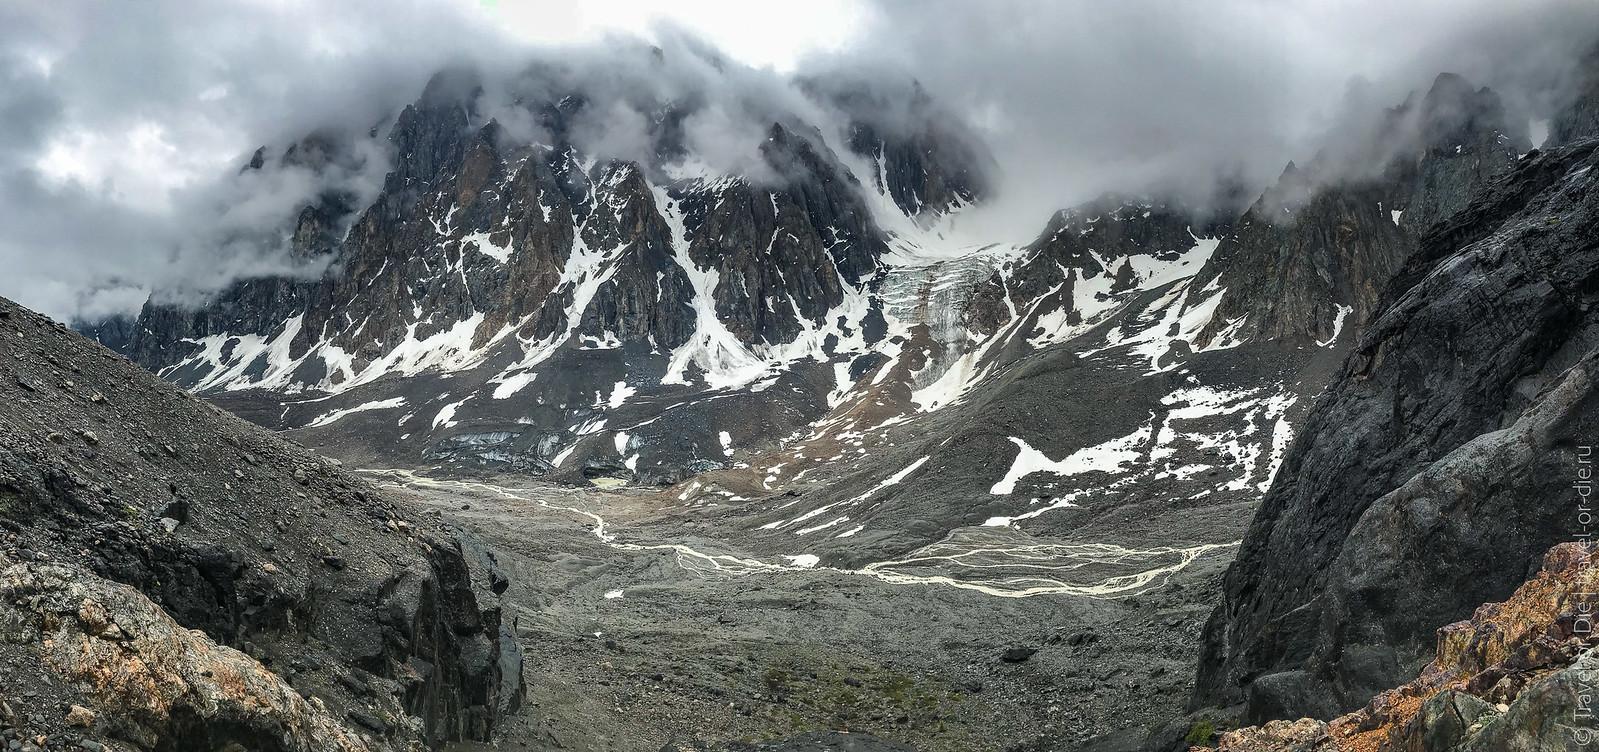 Aktru-Glacier-Altay-Ледник-Актру-Алтай-iphone-3260